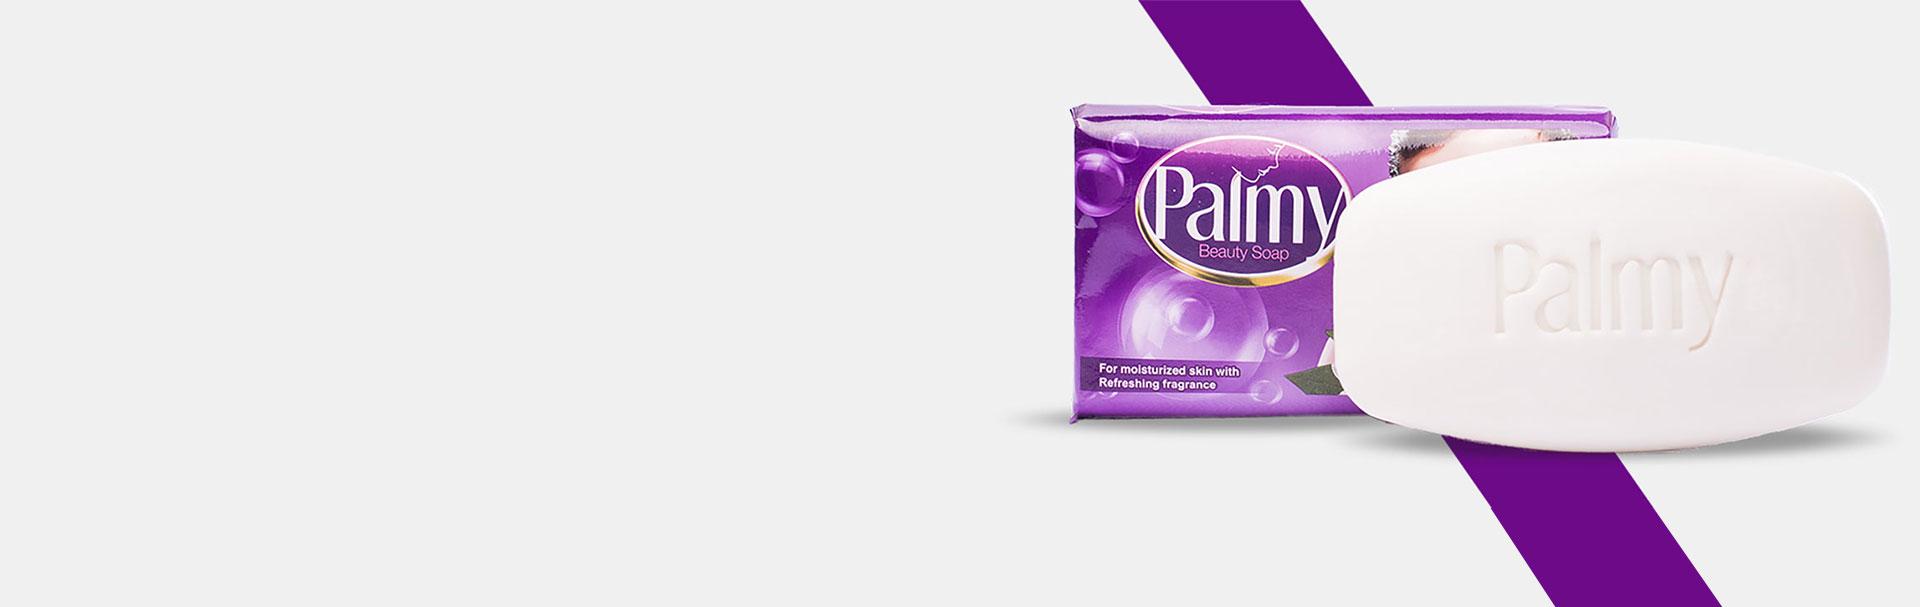 Palmy Beauty Soap Jasmine Fragrance